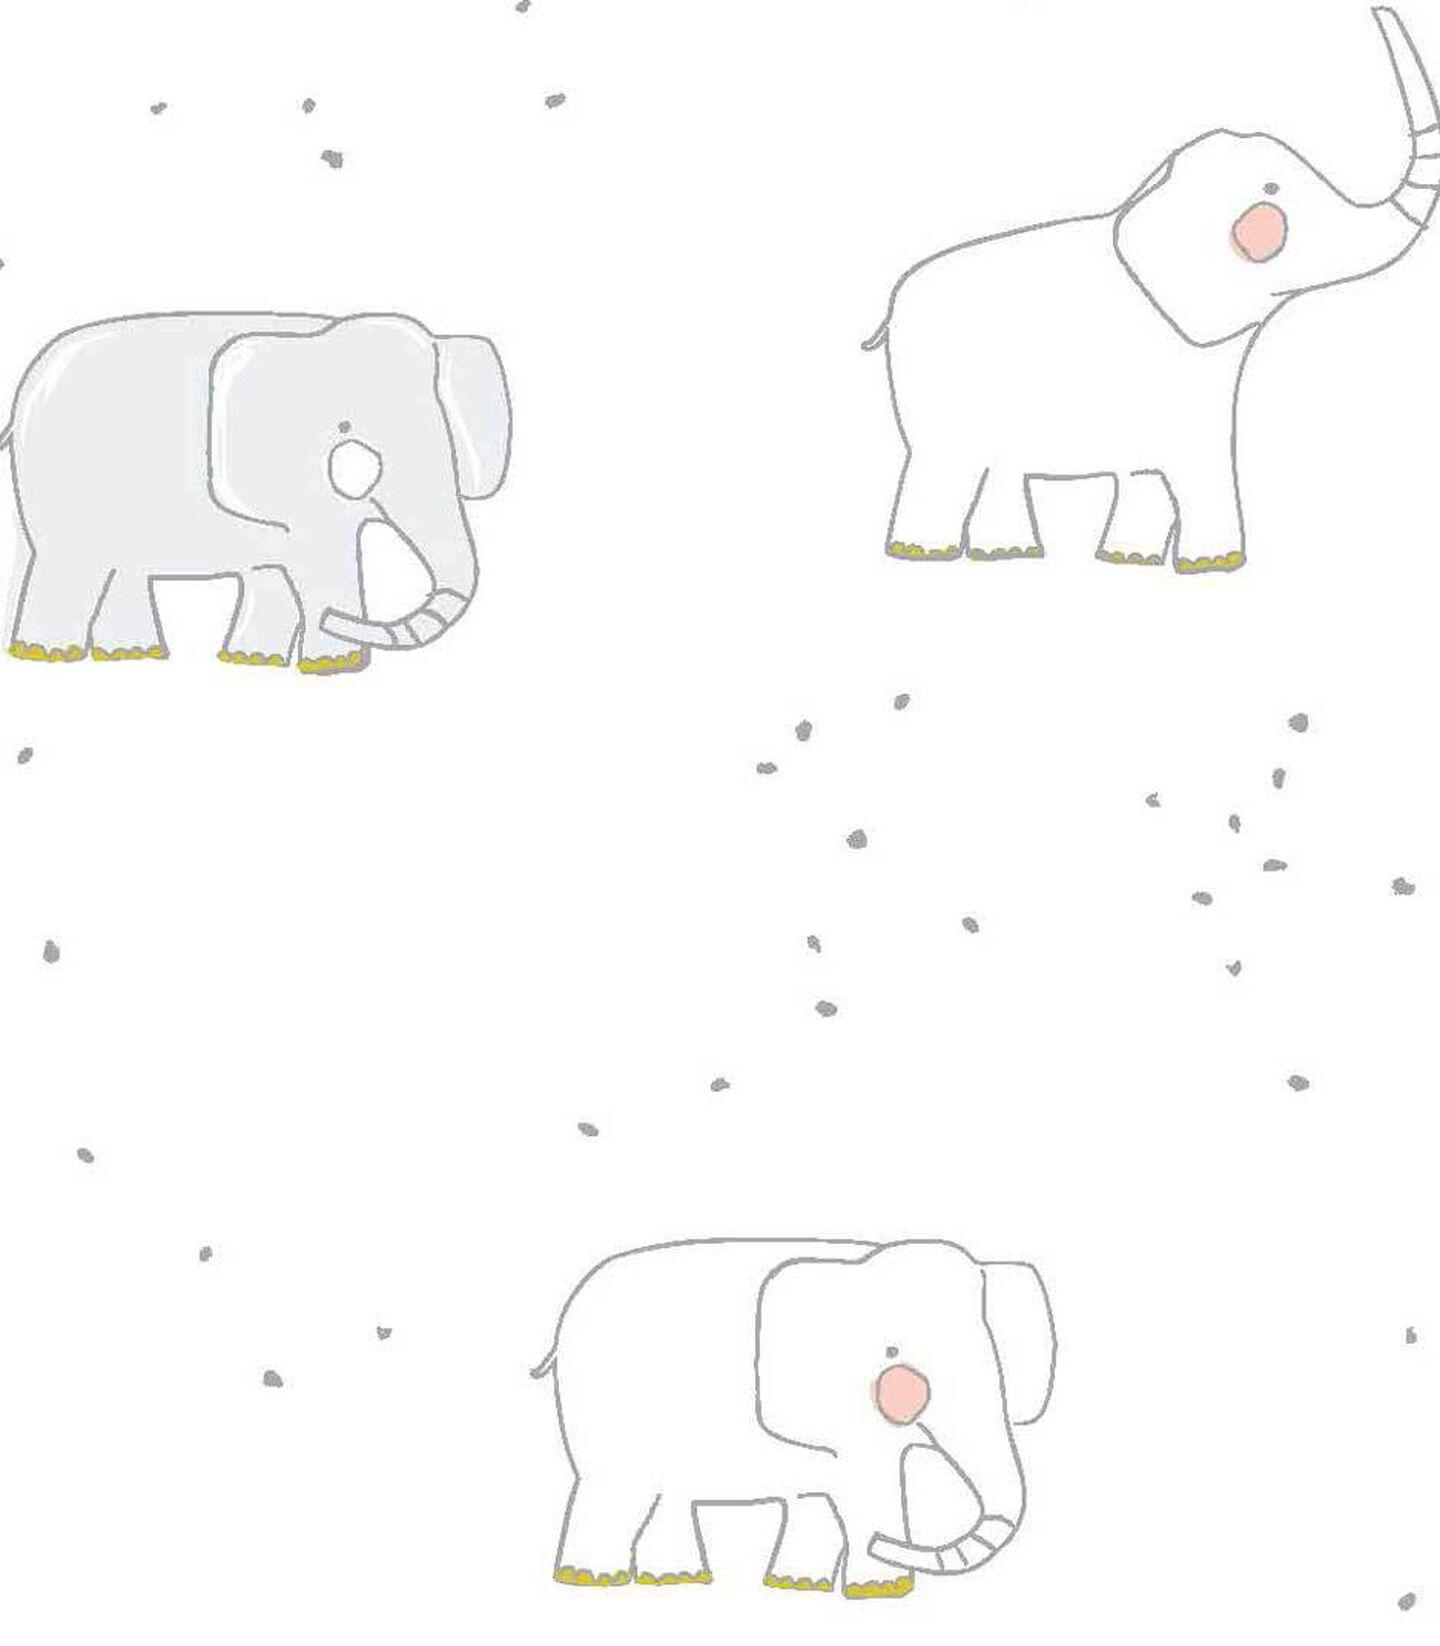 Petit-Pehr Elephant print for Stokke. Pattern detail.